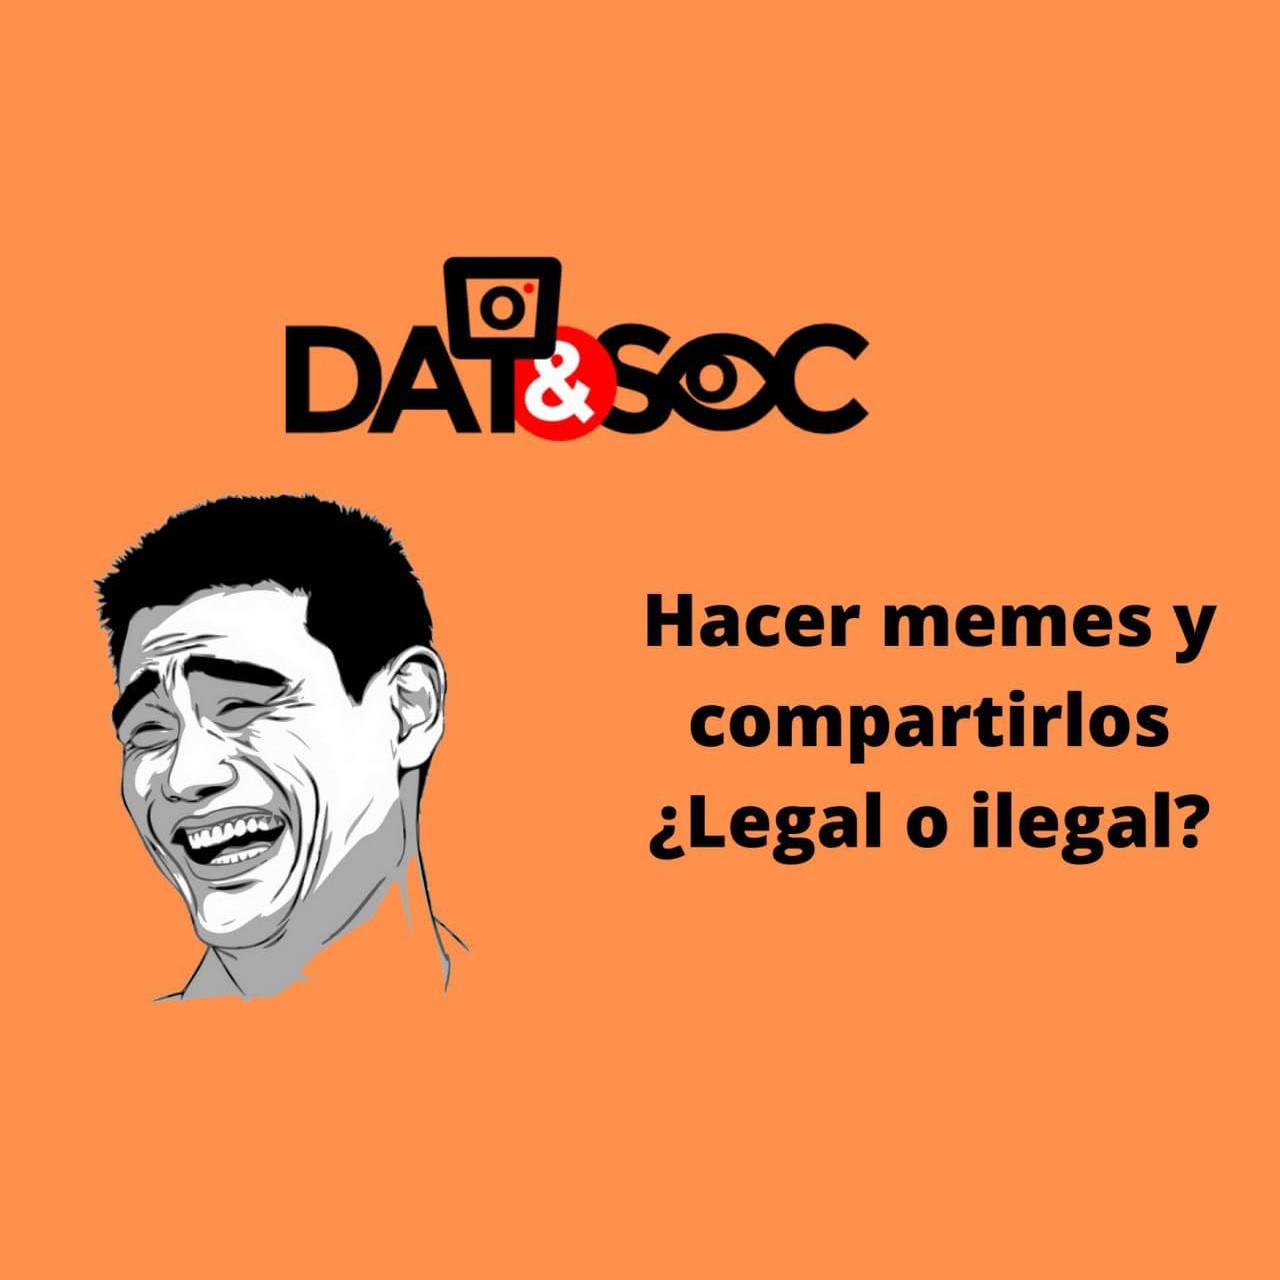 Hacer memes y compartirlos. ¿Legal o ilegal?